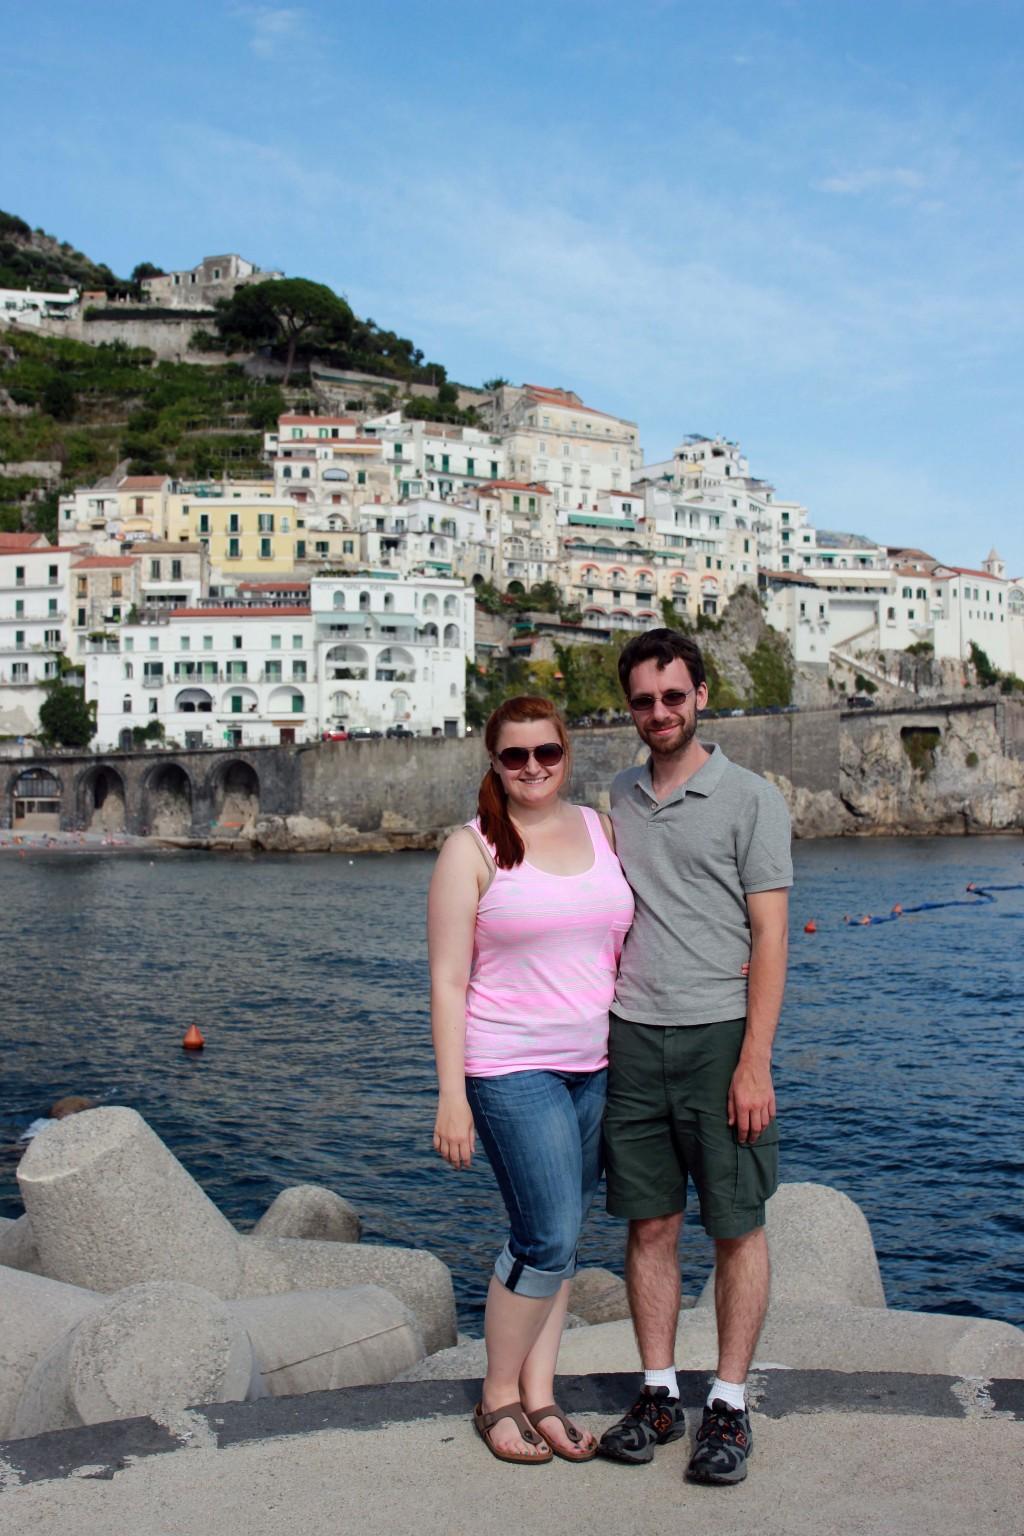 All Things Kate in Amalfi Coast